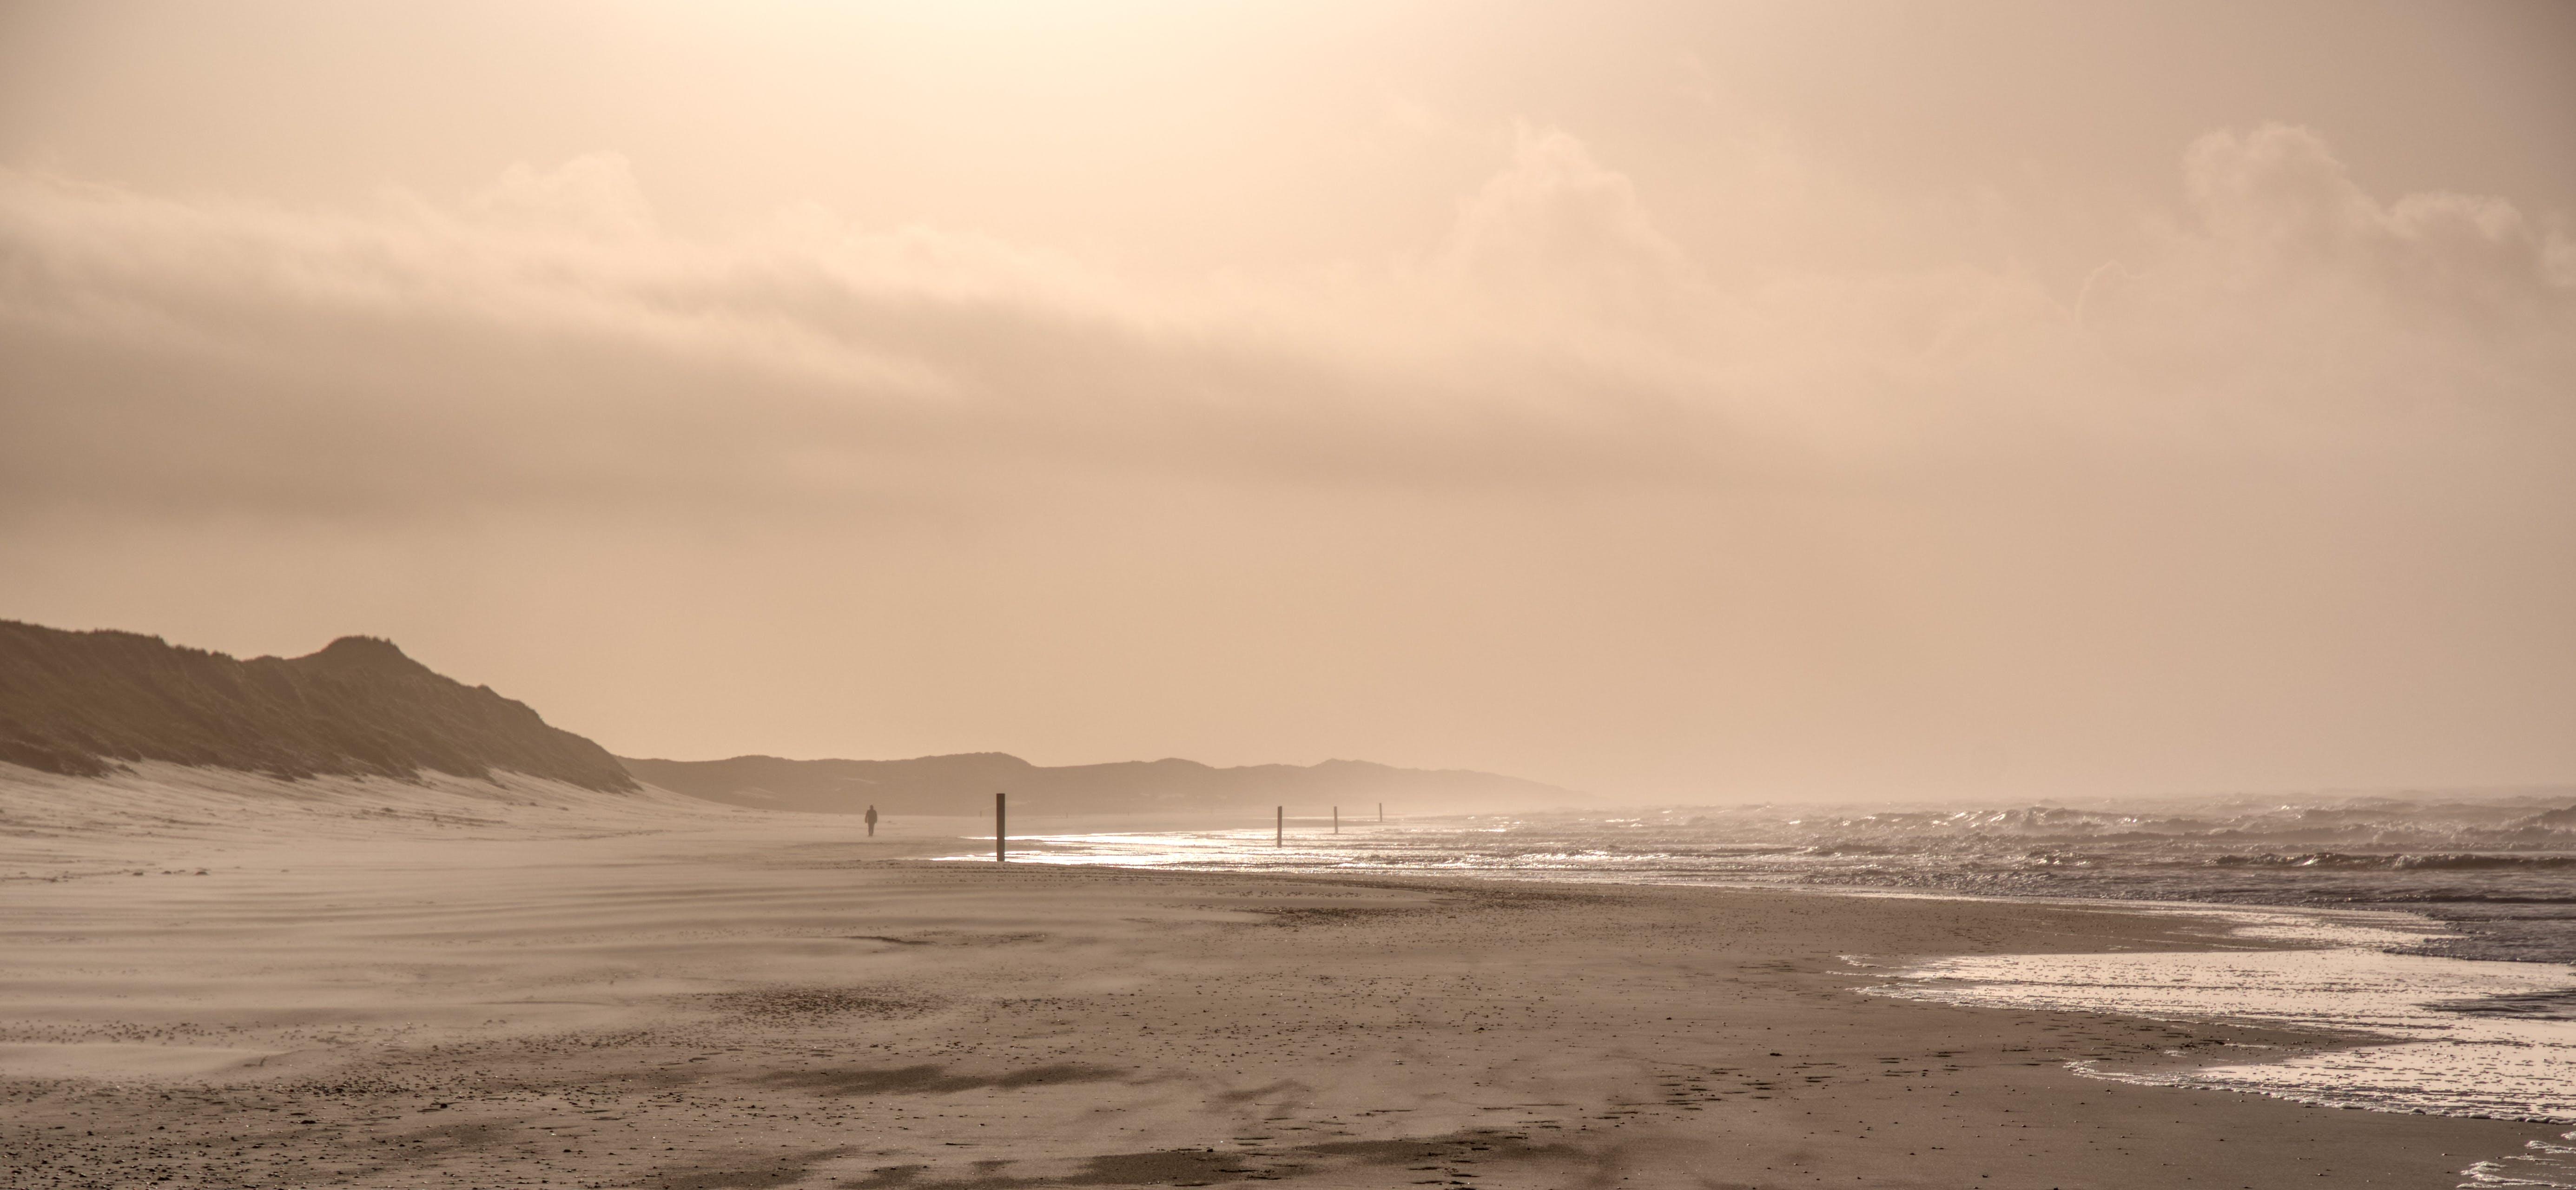 Free stock photo of dunes, landscape, sand dunes, sea